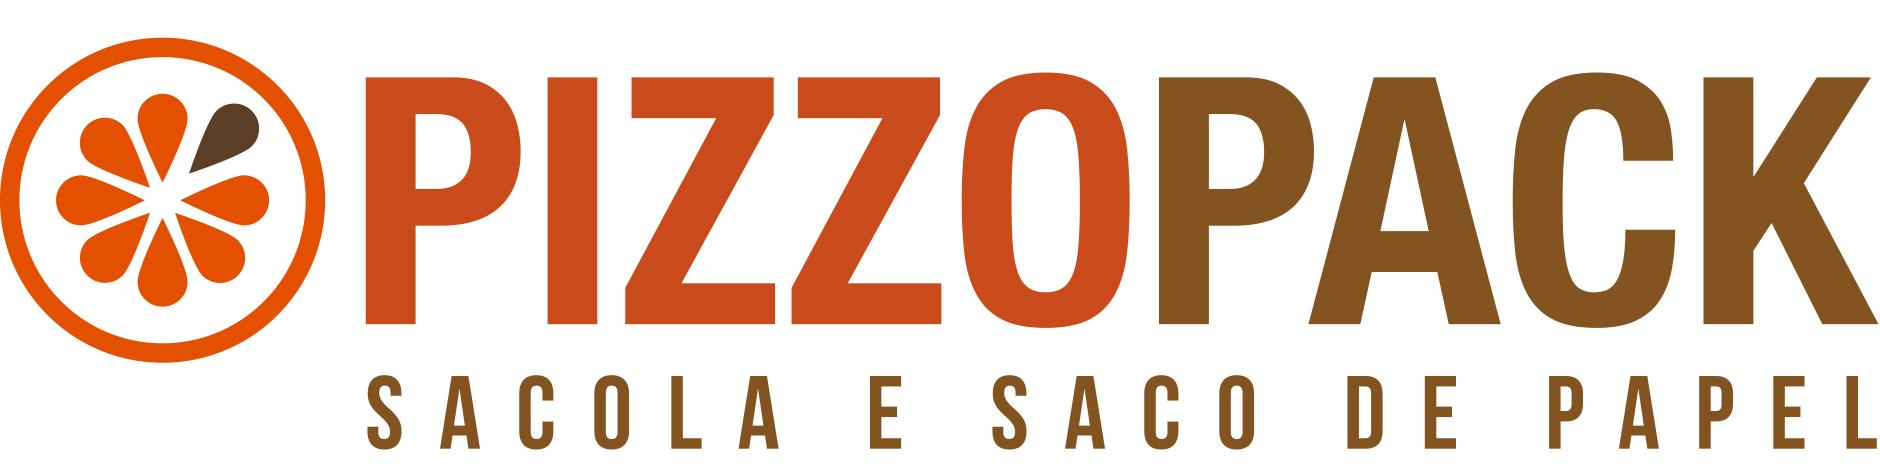 logo pizzopack